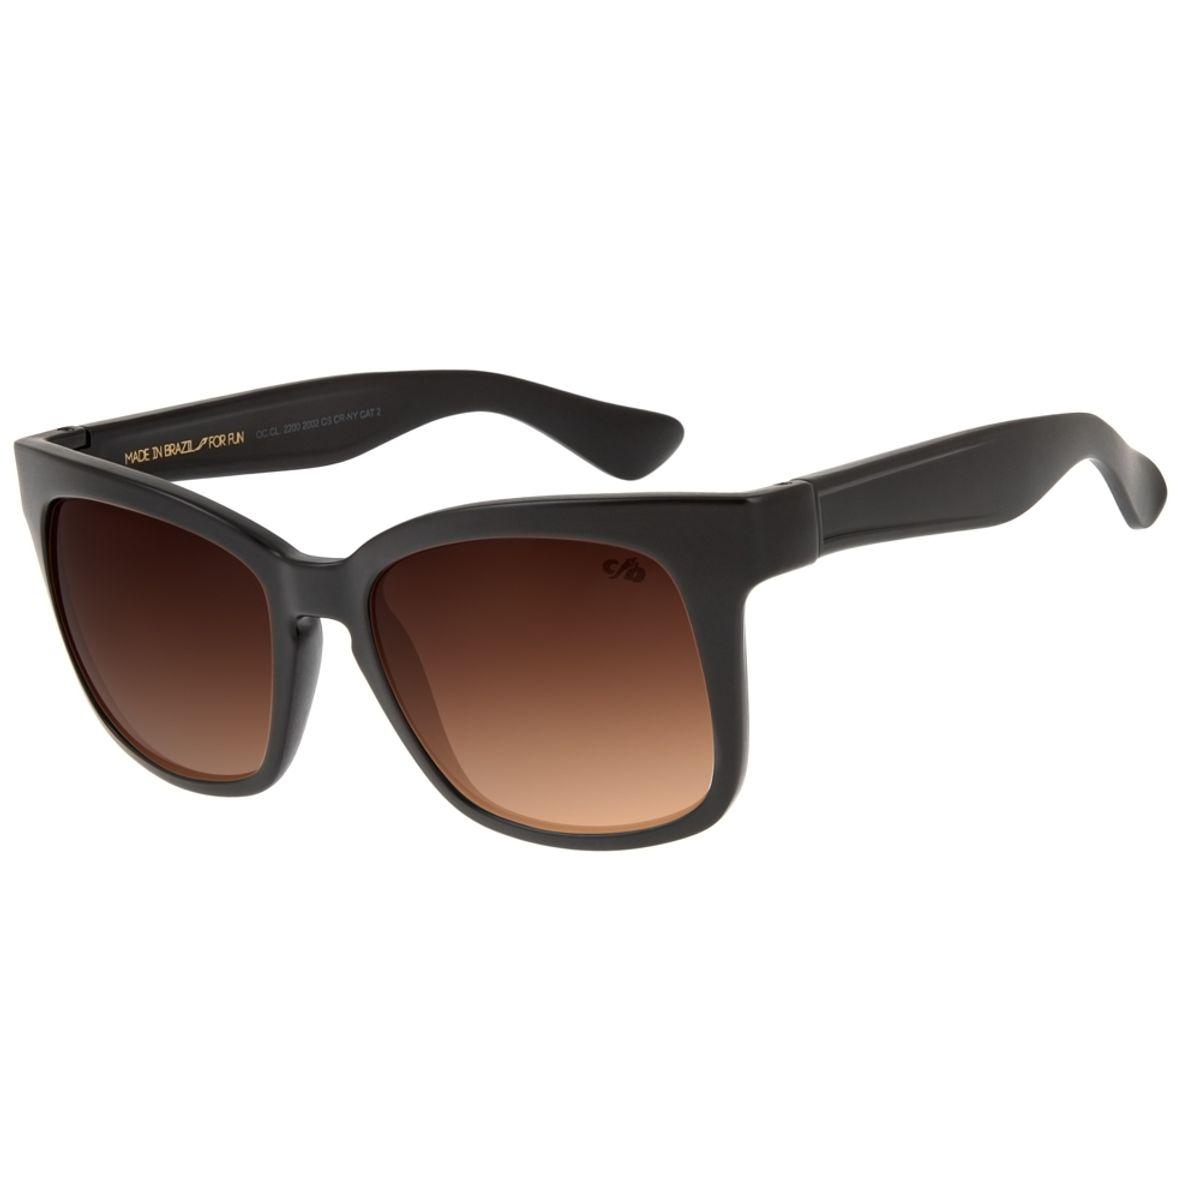 69bbff5ff Óculos de Sol Feminino Chilli Beans Quadrado Marrom Degradê - Chilli ...